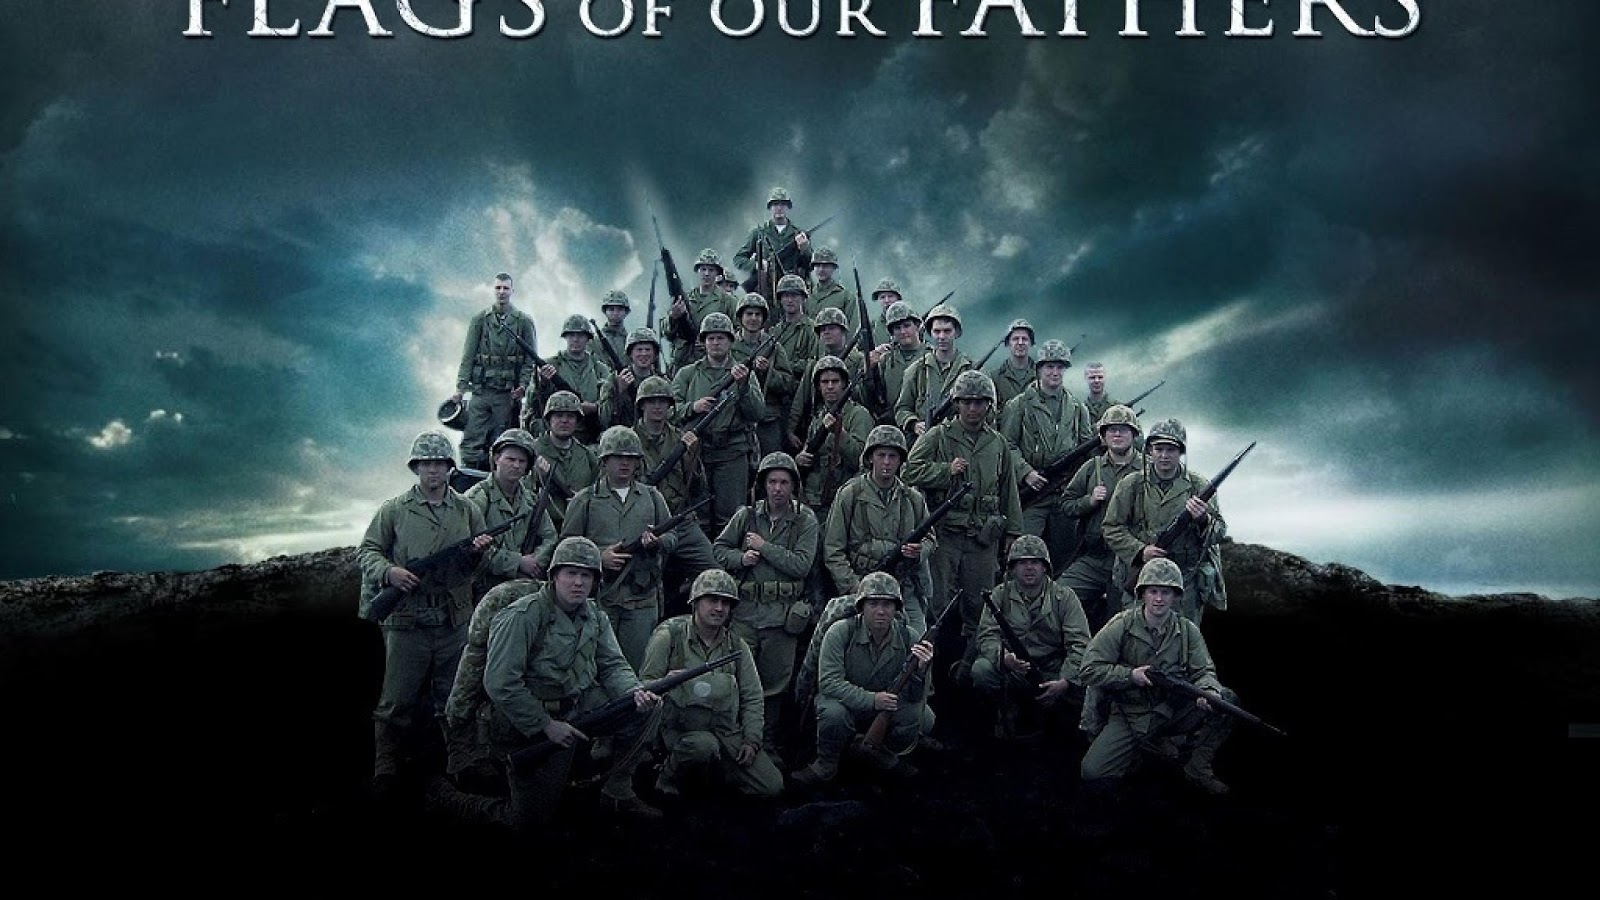 phim chiến tranh mỹ hay nhất